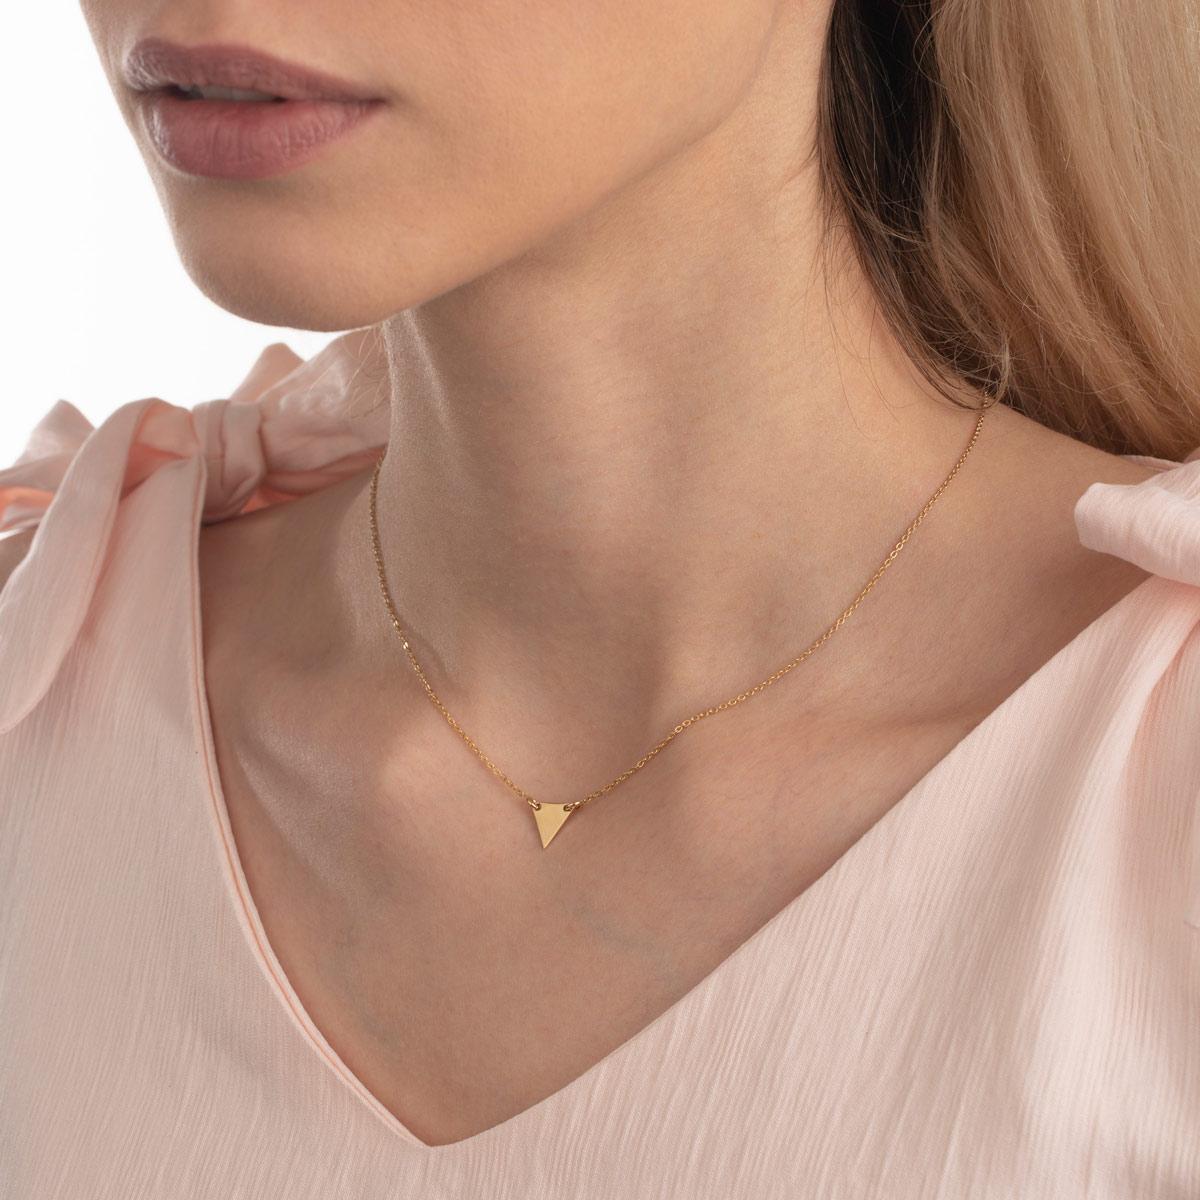 گردنبند طلا مثلث با حلقهچه